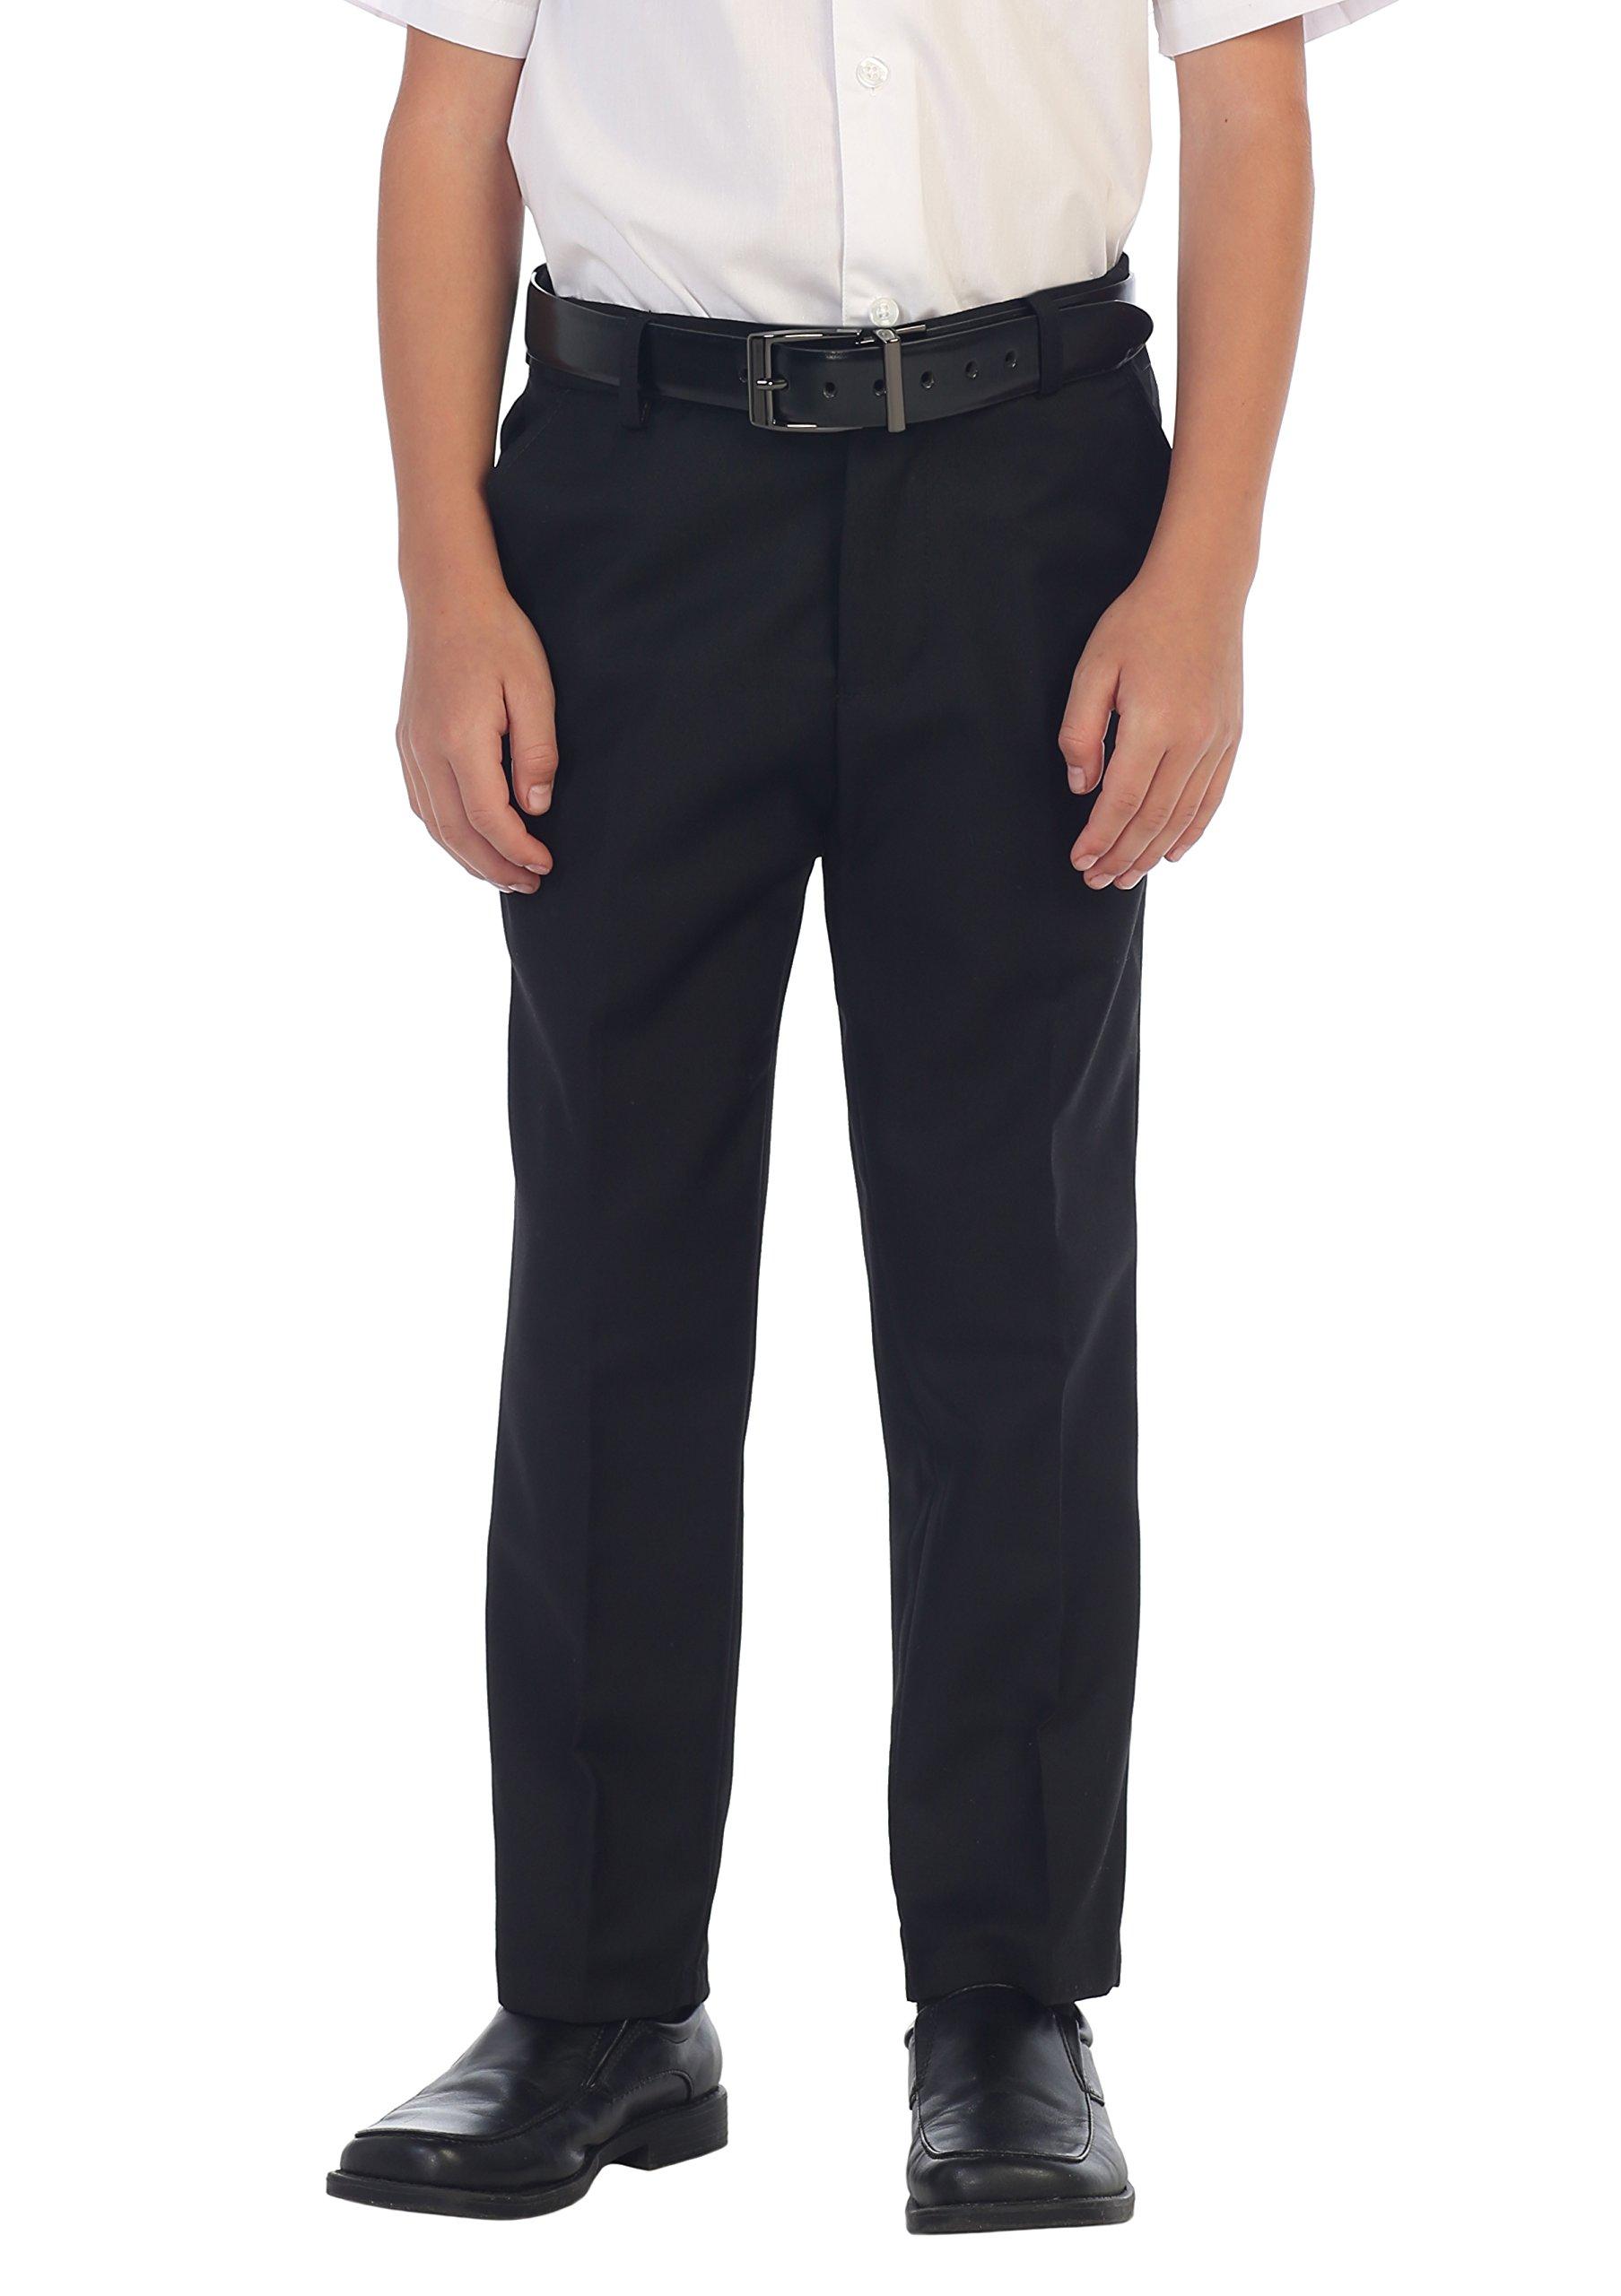 Gioberti Boys Flat Front Dress Pants, Black, 12